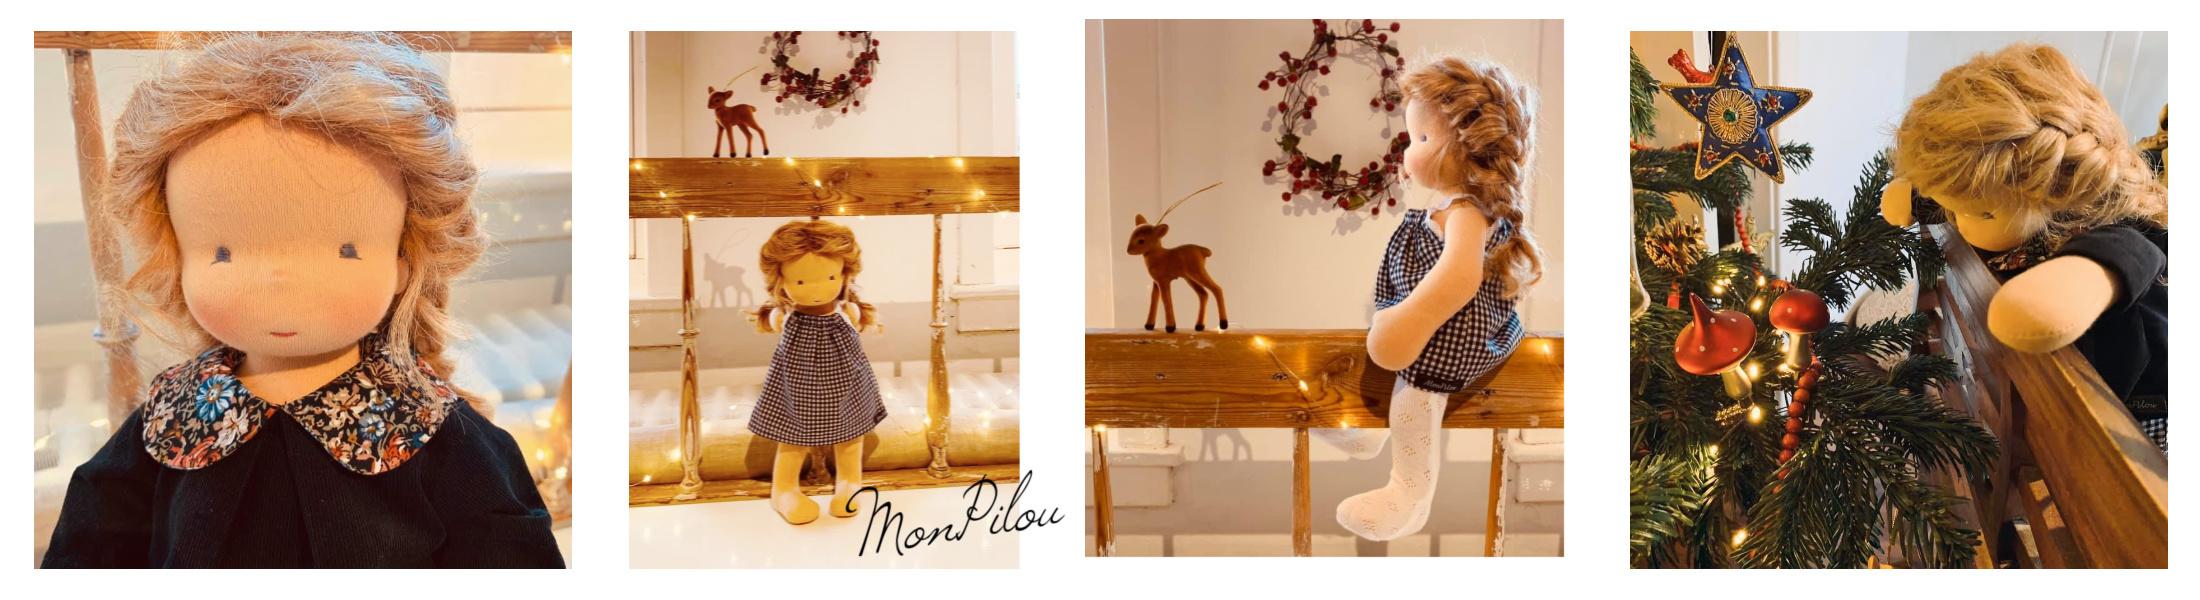 Waldorf poppen - Waldorf dolls